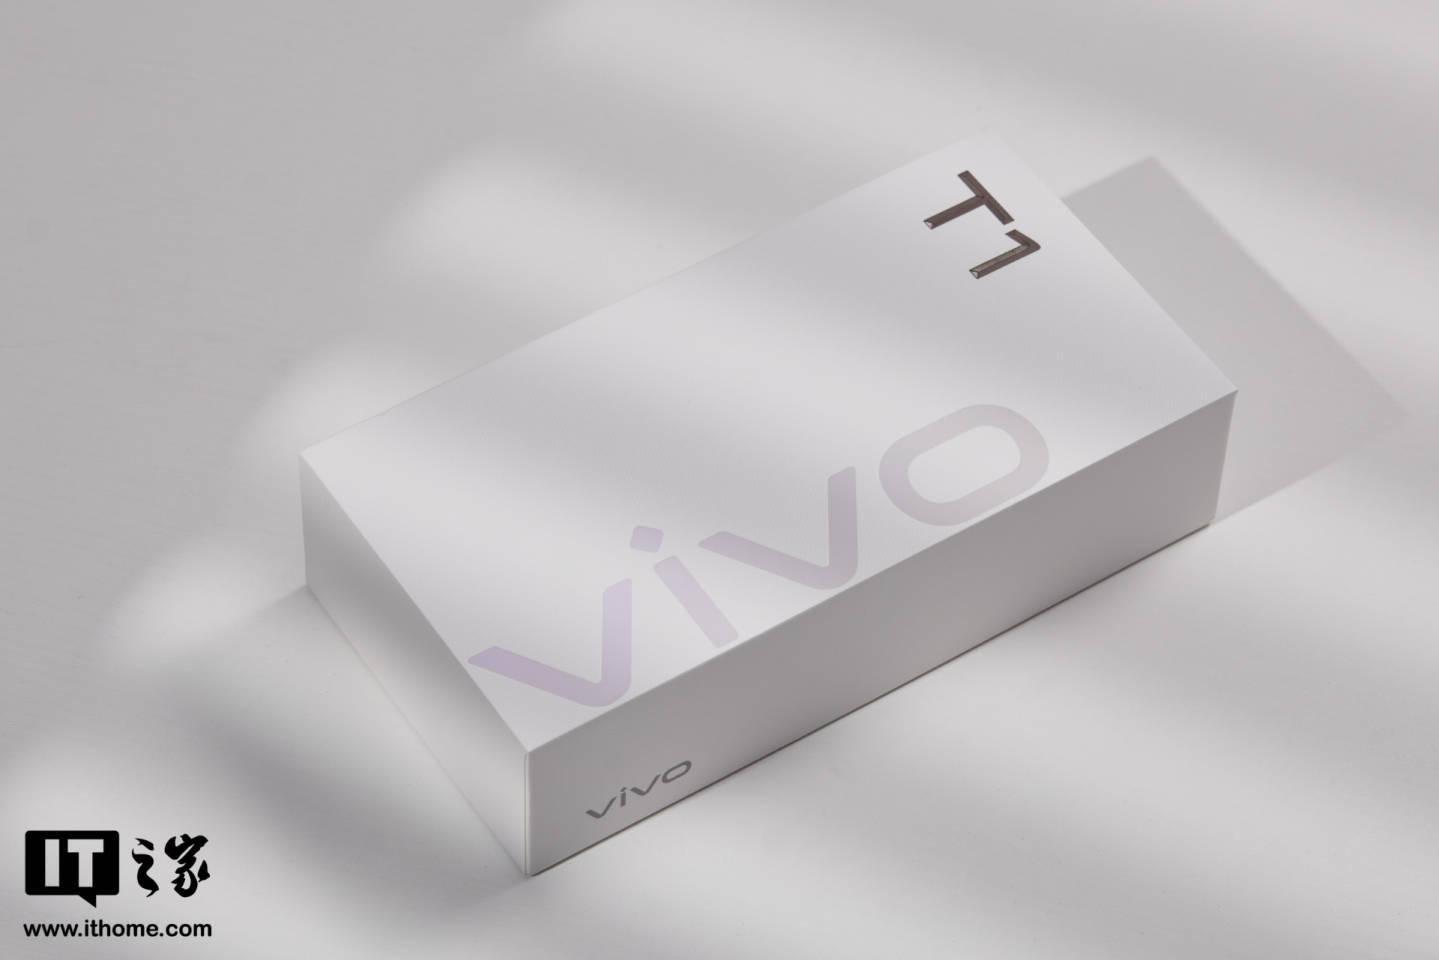 【IT之家開箱】vivo T1 5G 手機圖賞:高刷原色屏,